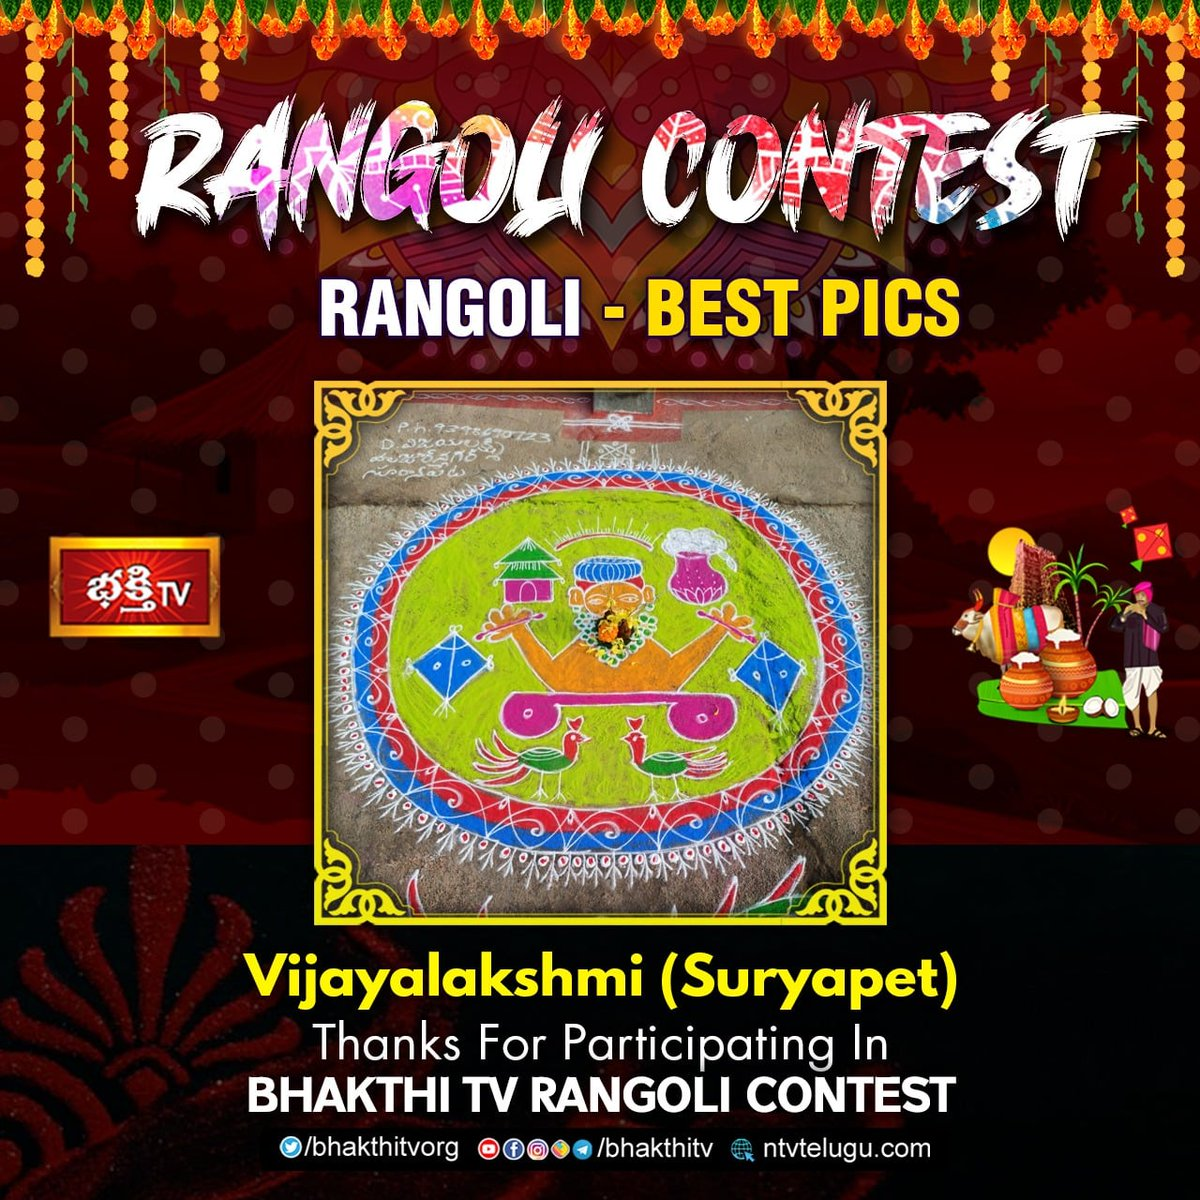 Here are the best pics of #BhakthiTV's #Sankranti Rangoli contest! Thank you all for participating in contest. Full Album >>  #Sankranthi #Pongal #Sankranti2021 #Rangoli